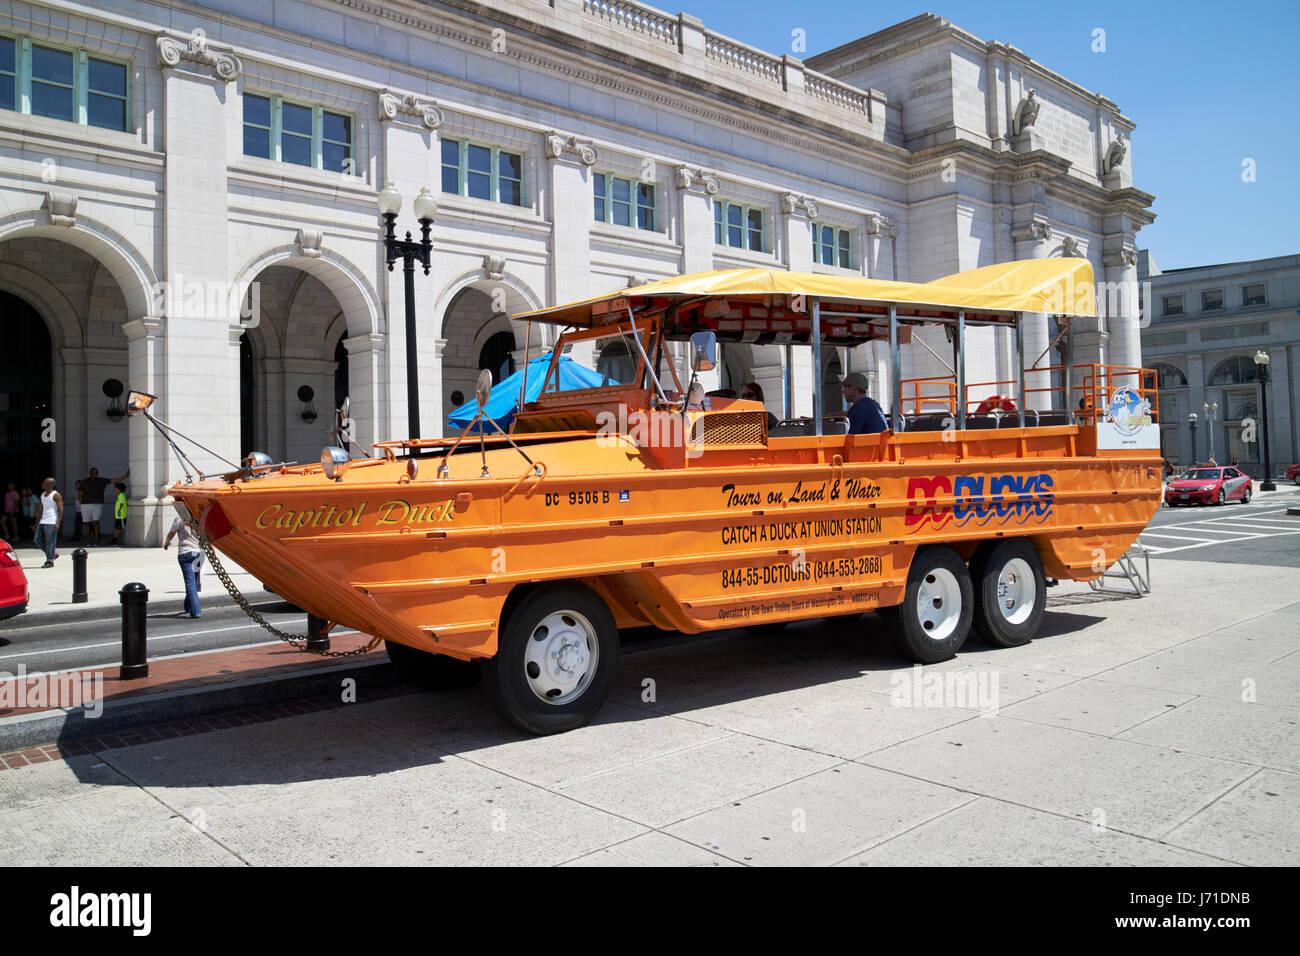 capital duck dc ducks tour Washington DC USA - Stock Image